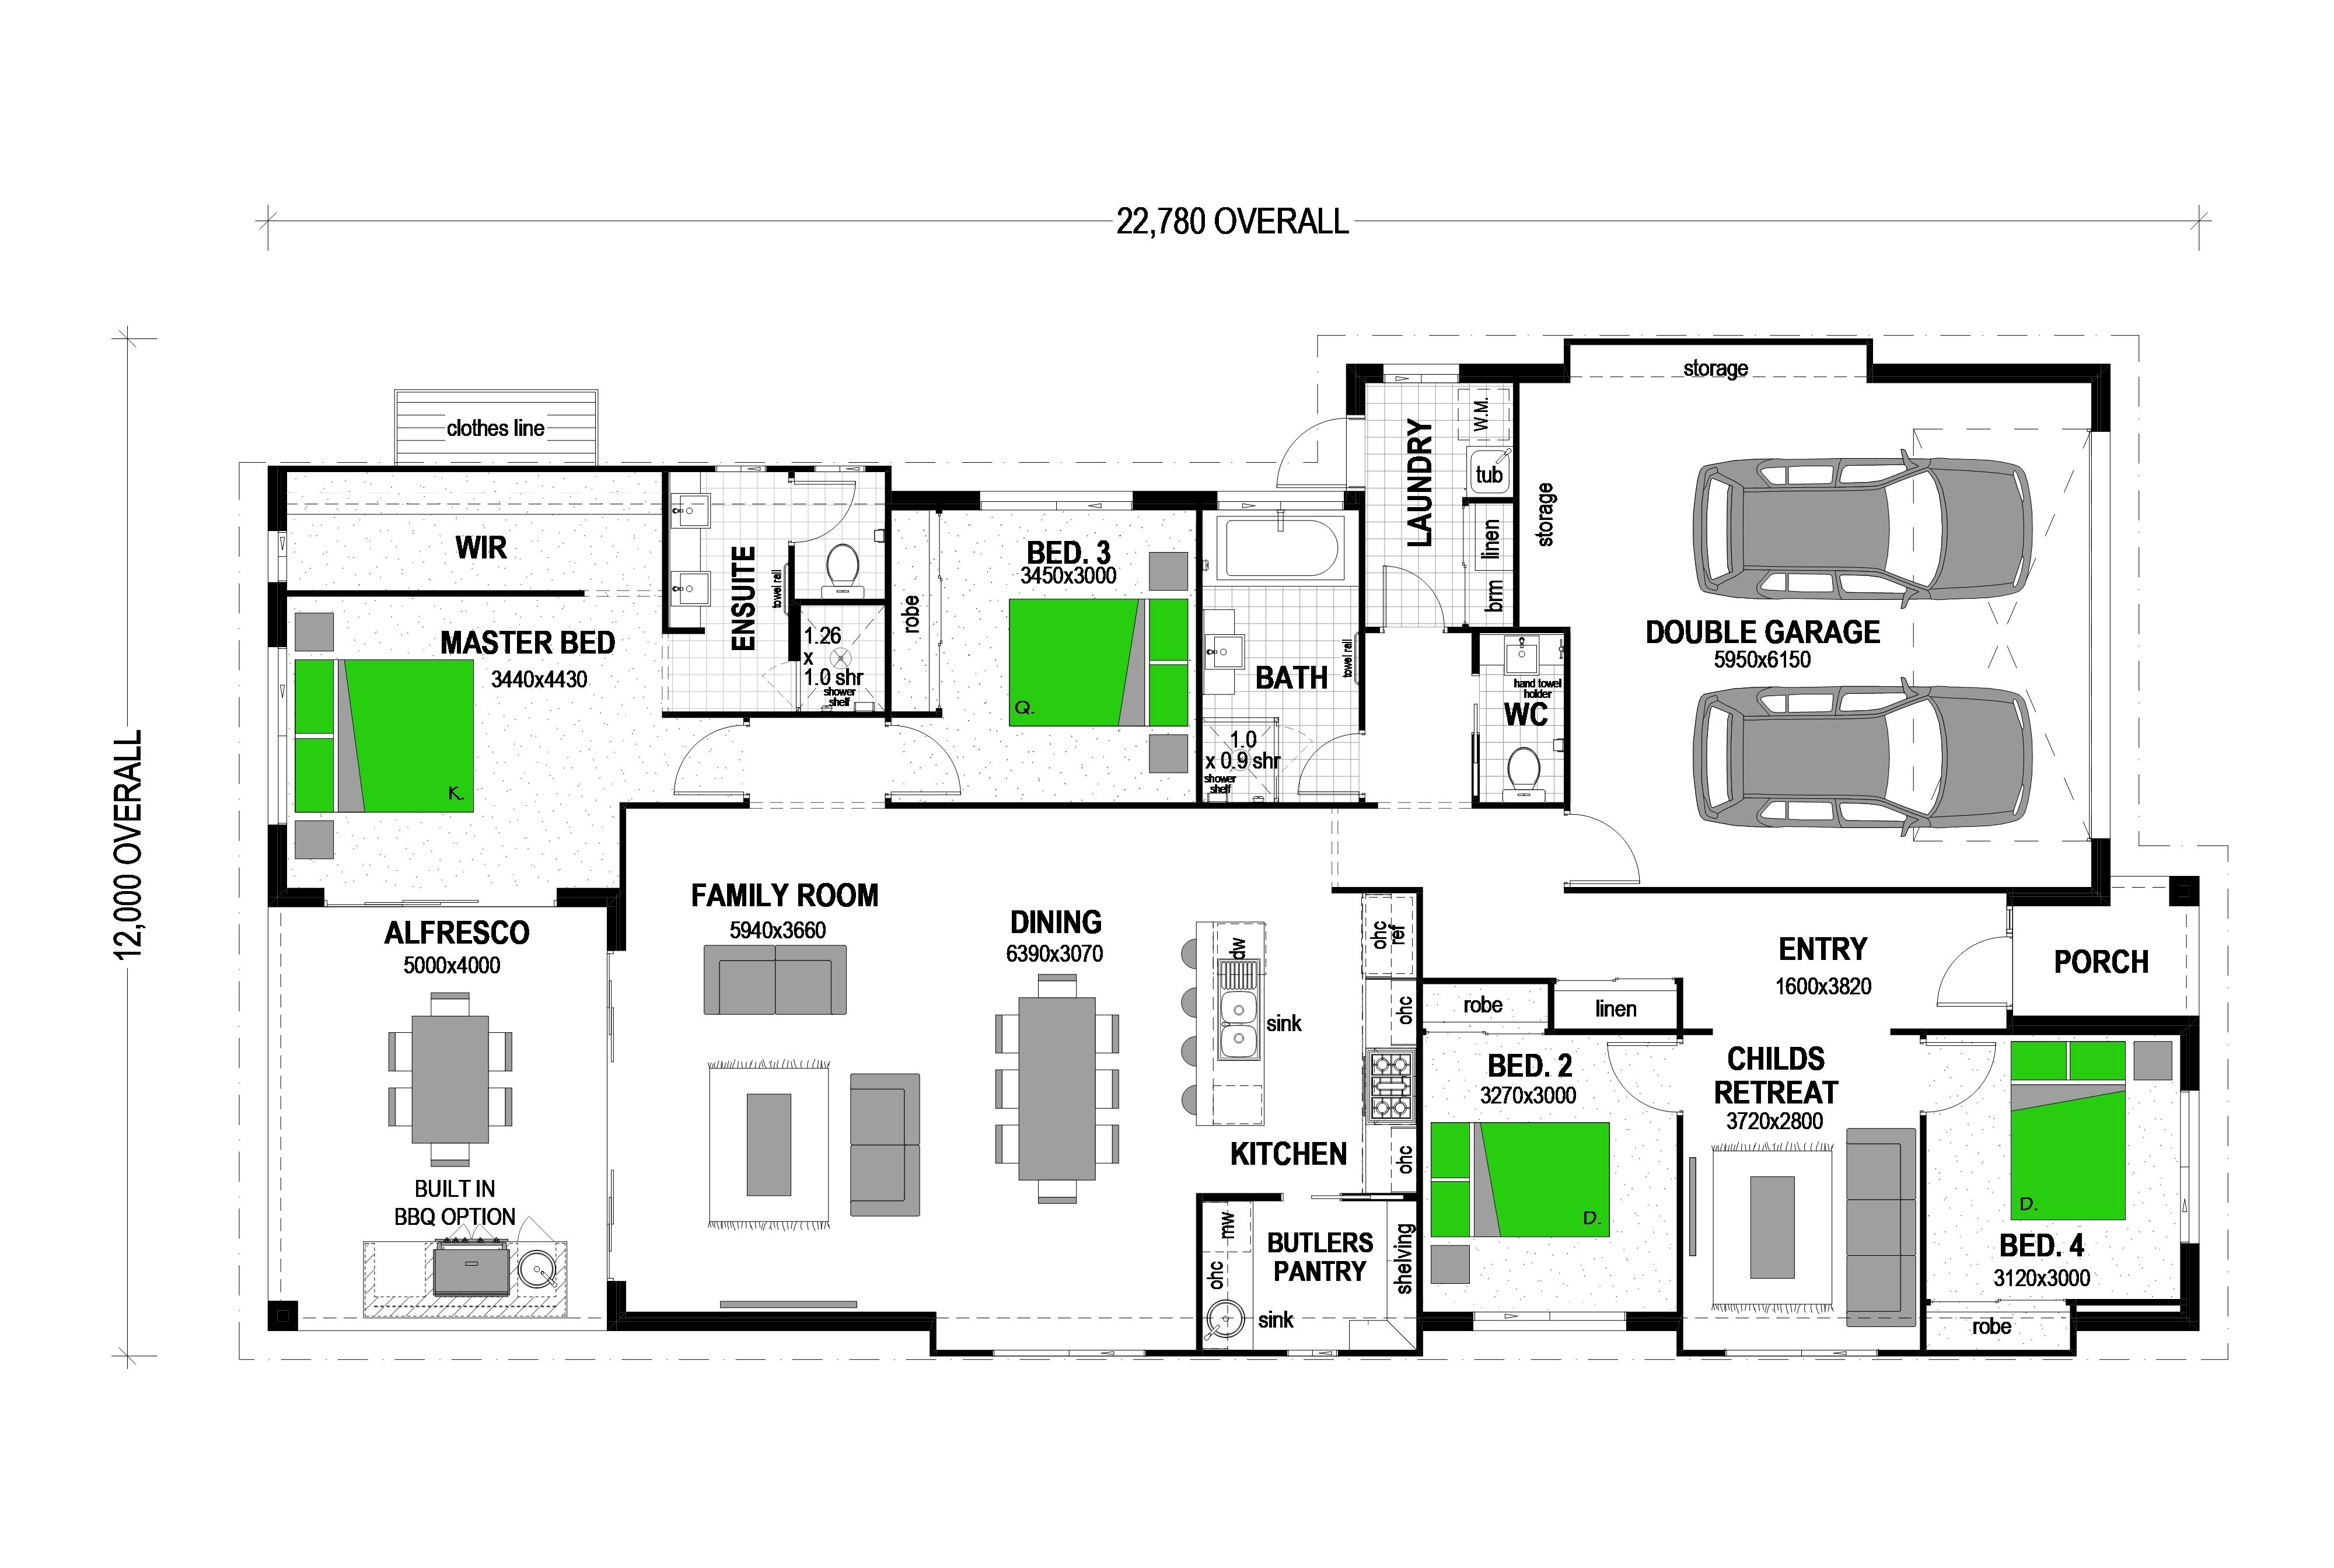 LOT 117 MYRL STREET, THE OUTLOOK CALALA Floorplan